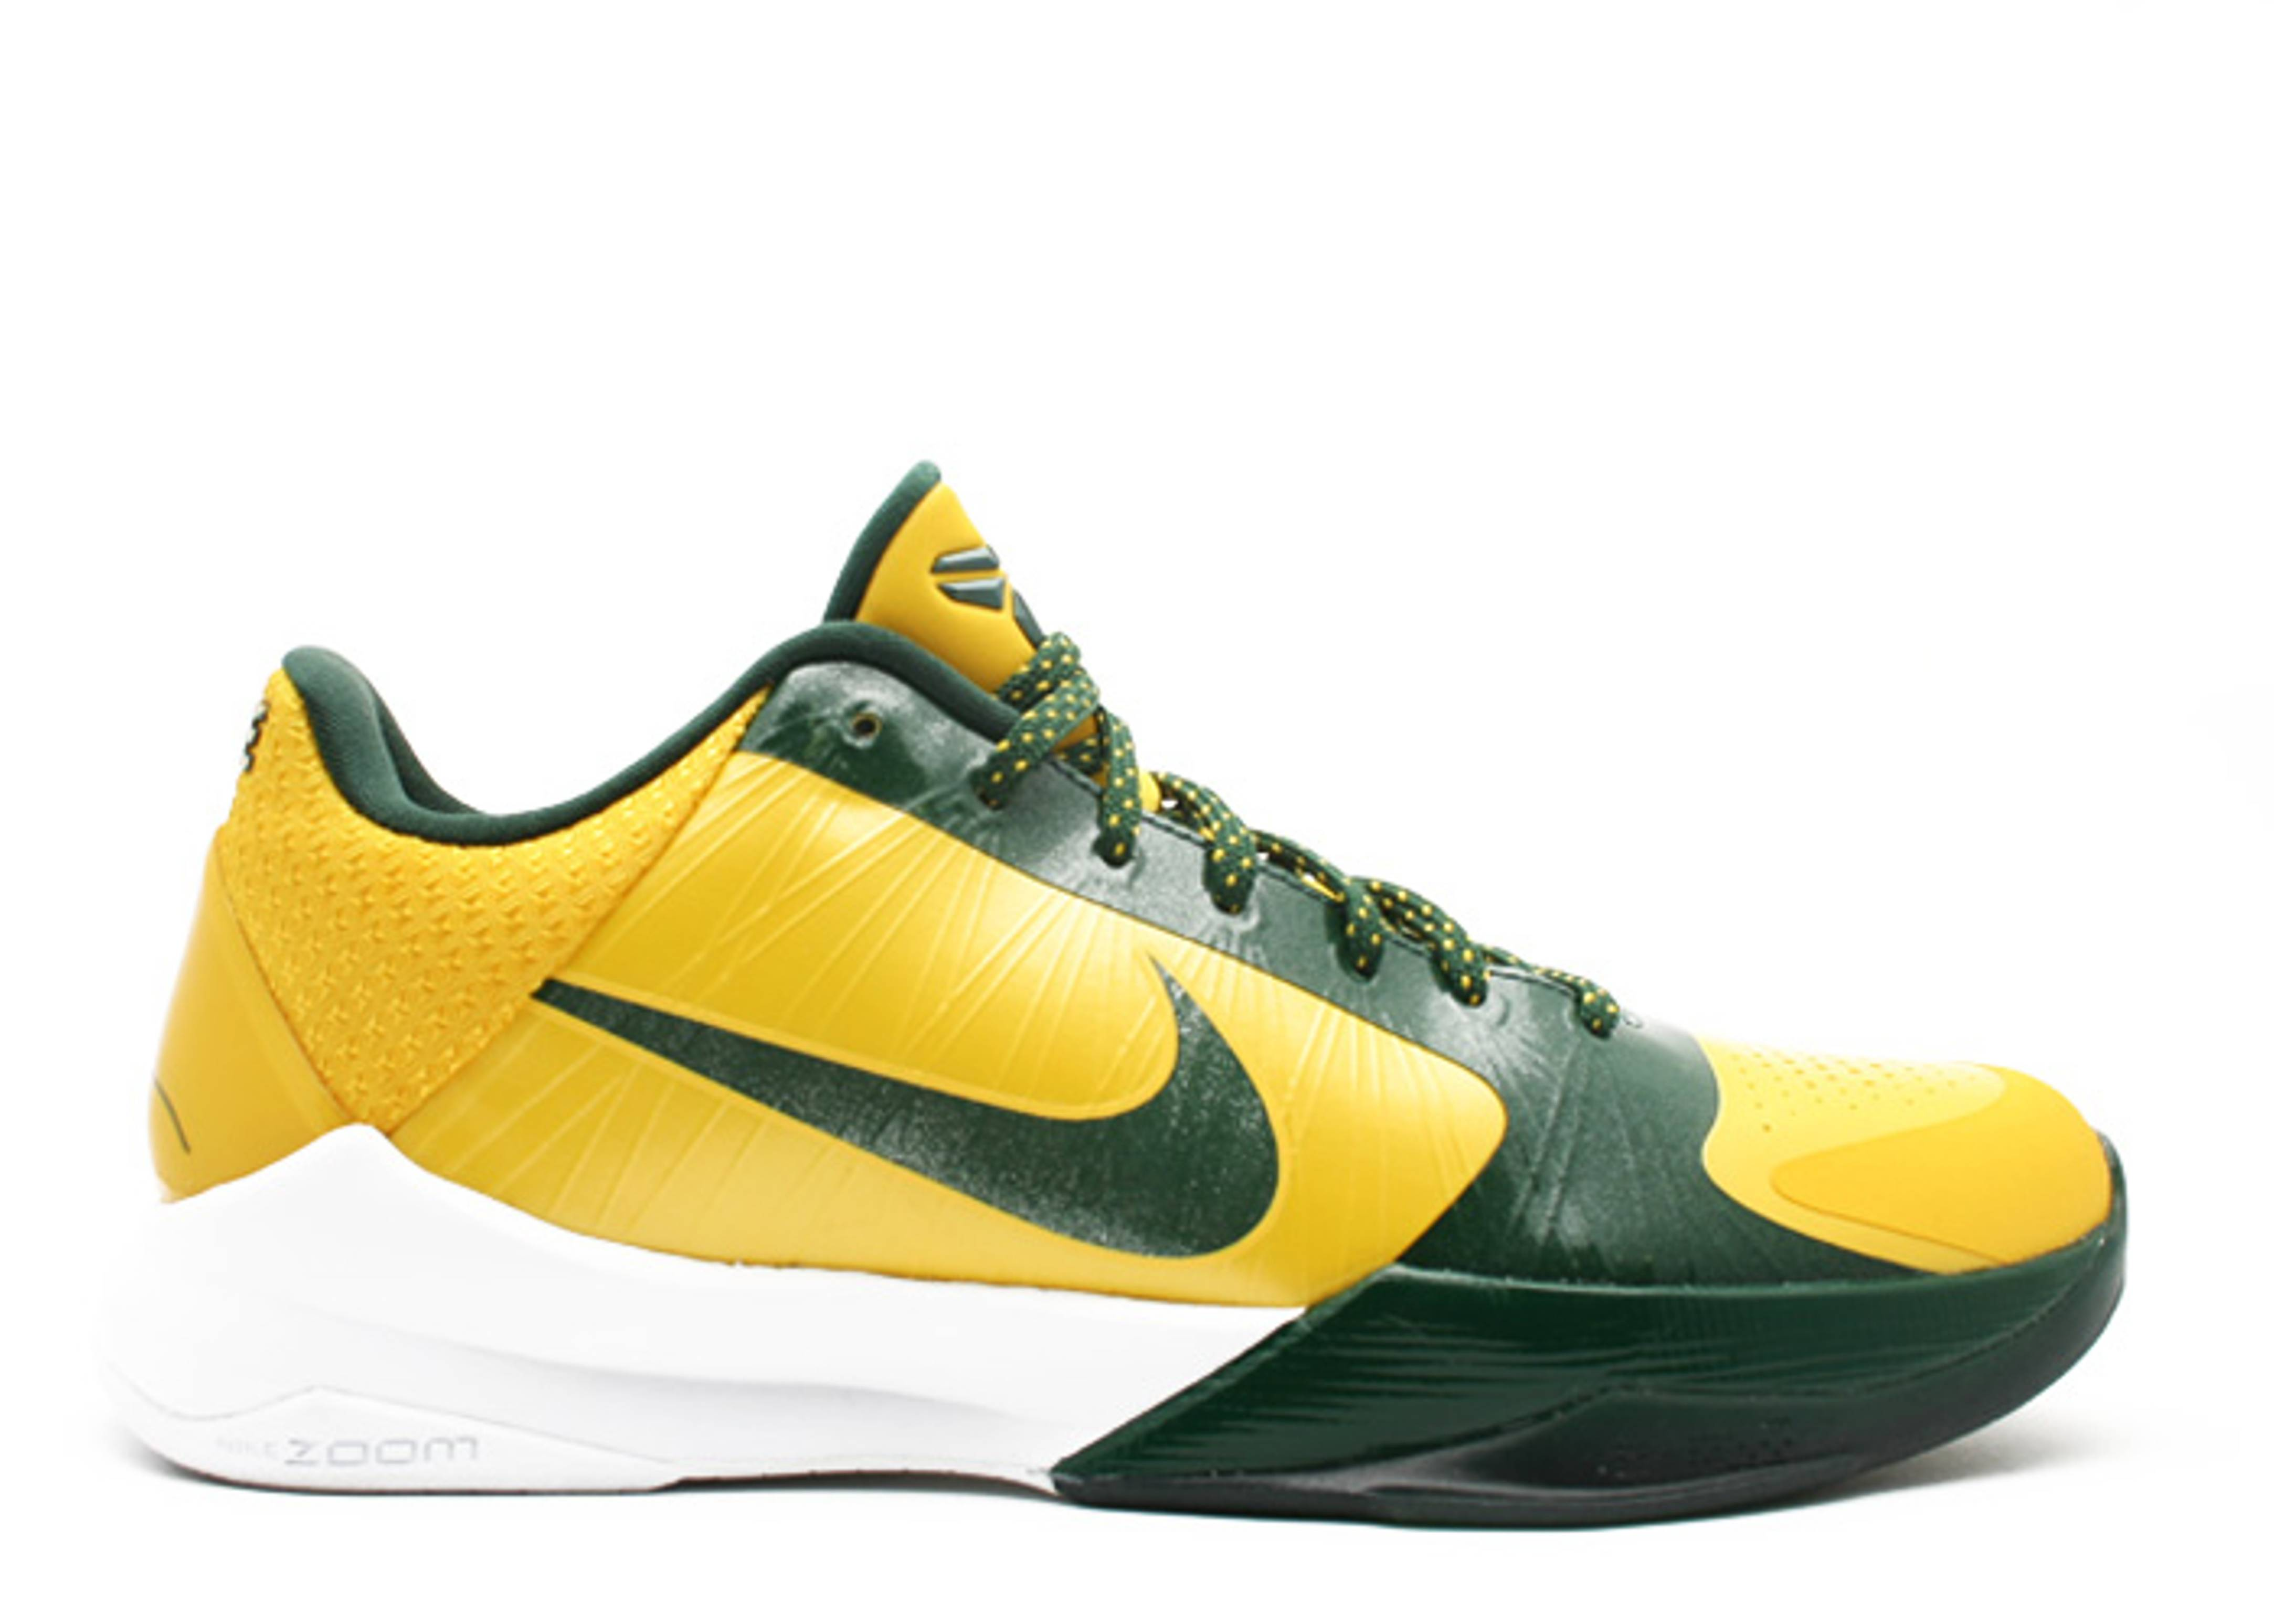 wholesale dealer c4f3a d730f Zoom Kobe 5 - Nike - 386429 700 - vrsty mz dp frst-white (rice ...